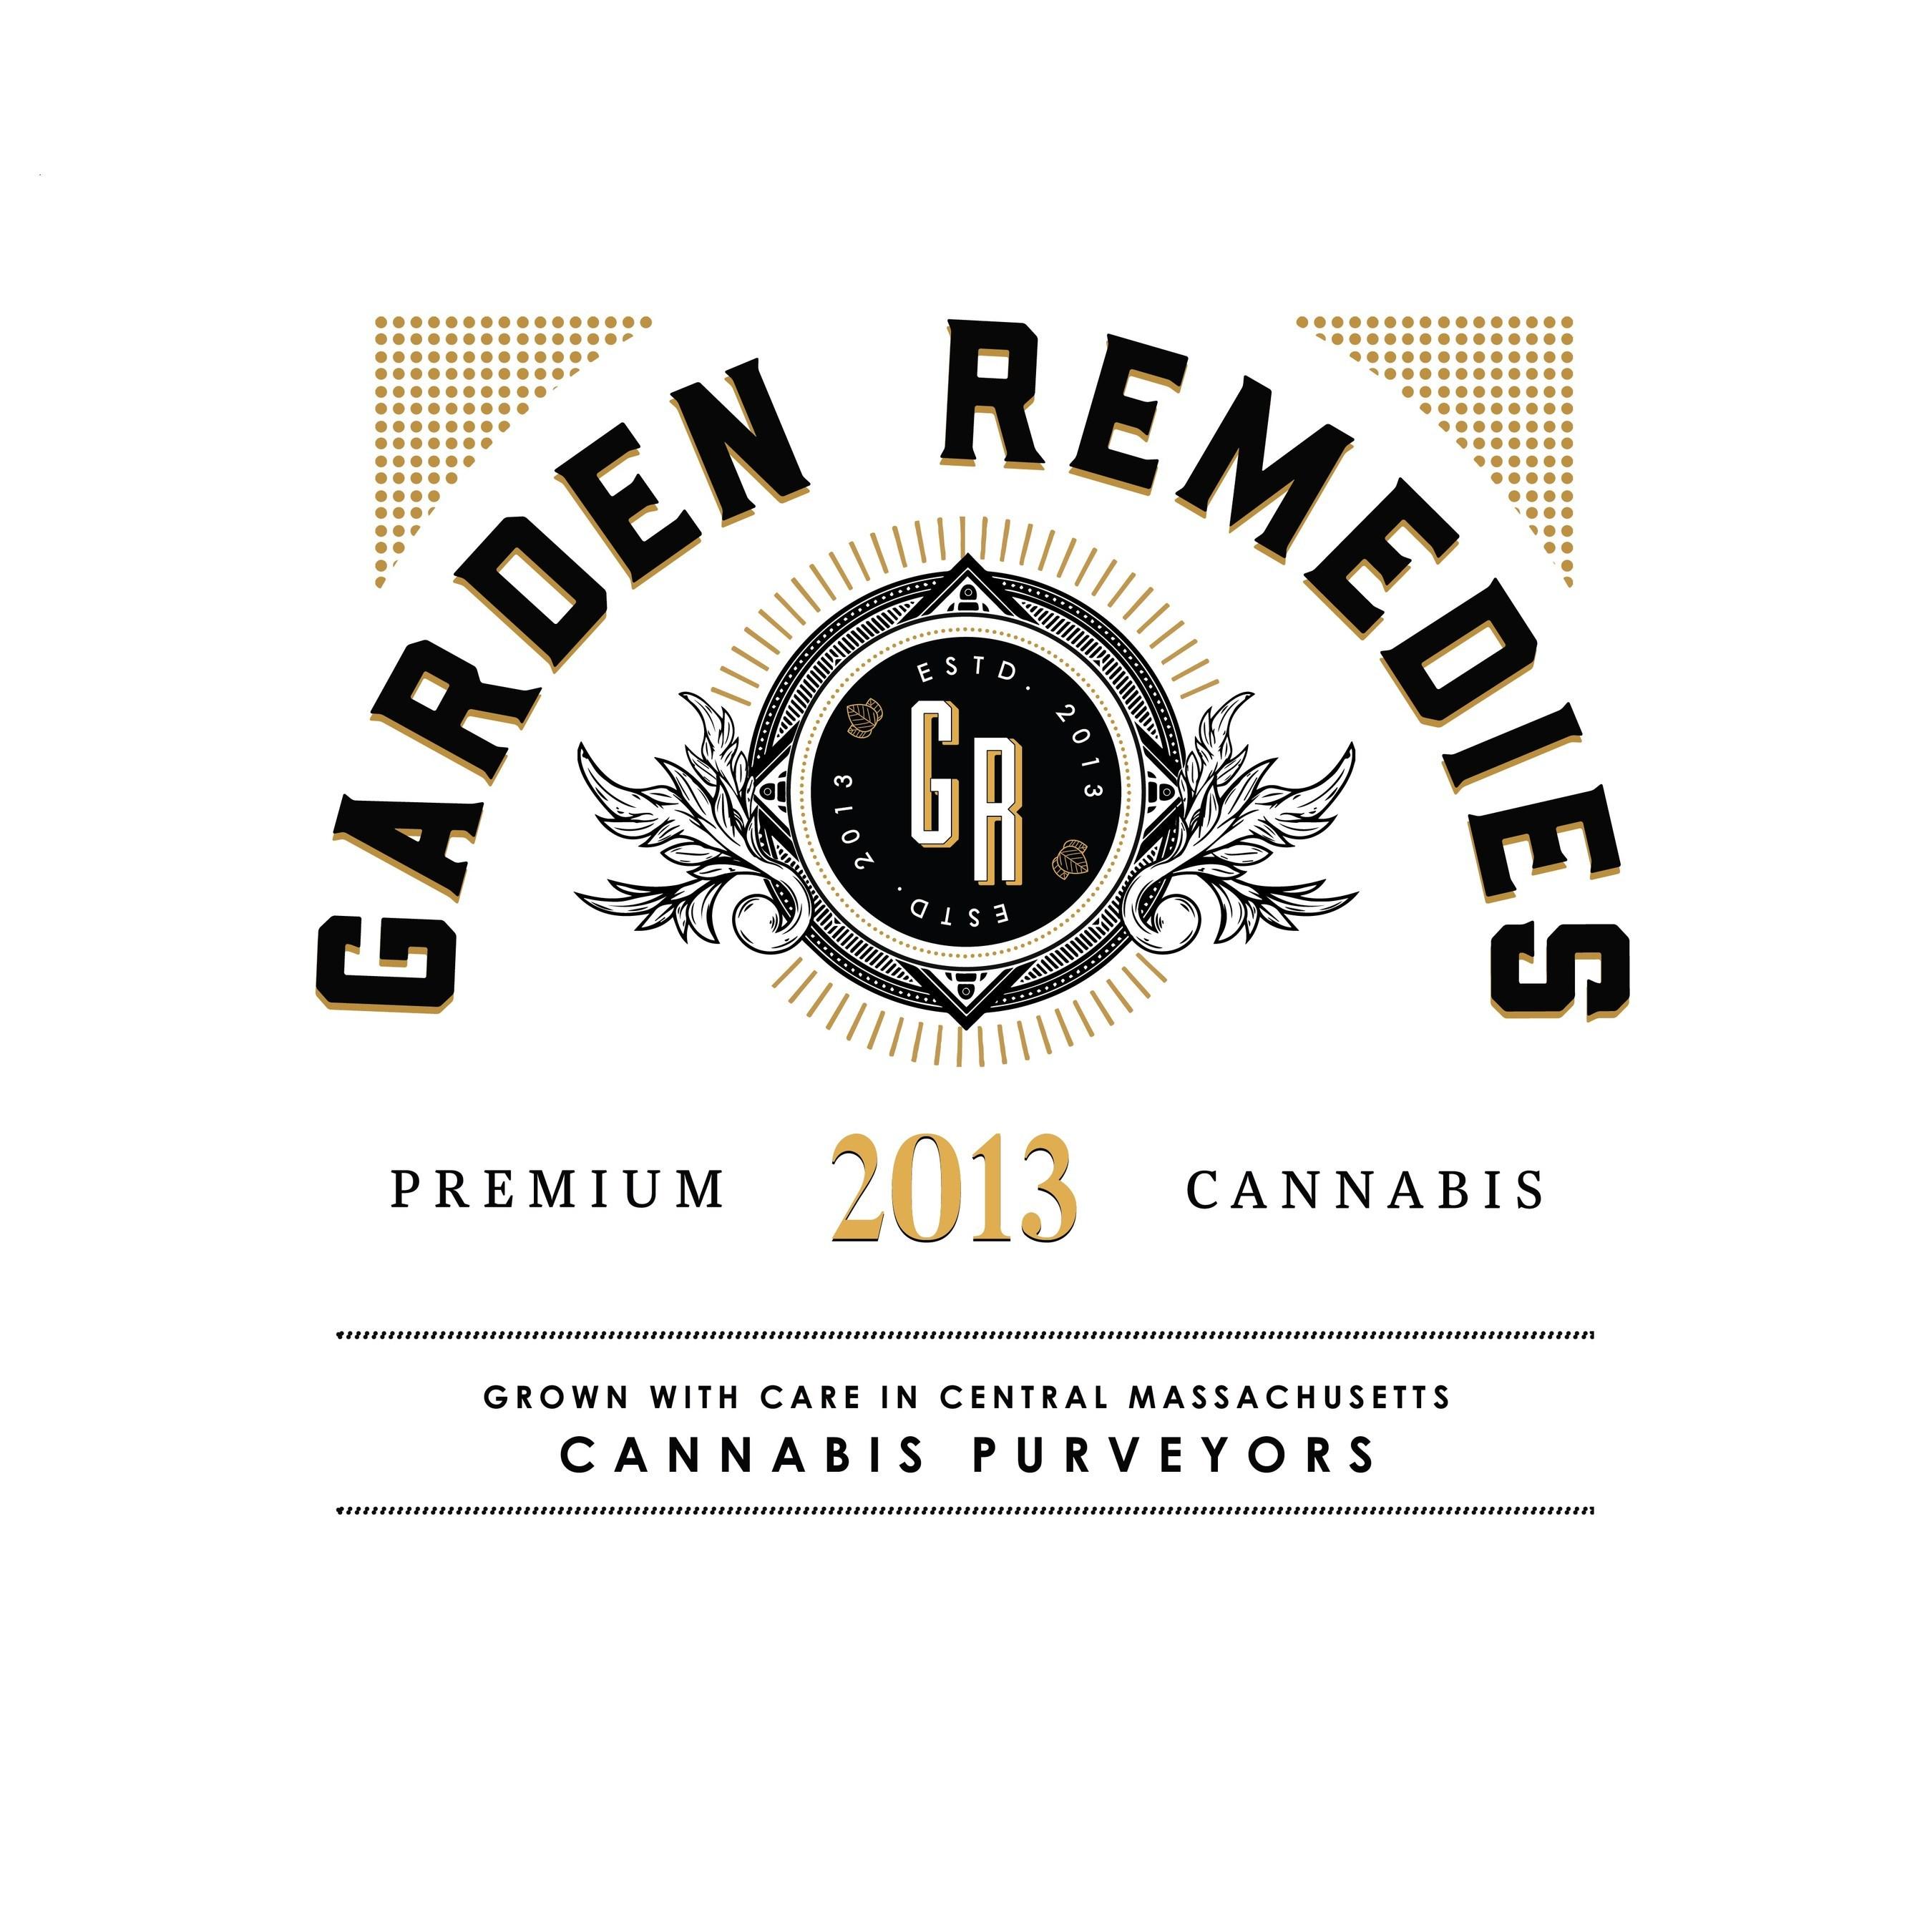 Garden Remedies Inc Confirms New 2018 Cannabis Special Permits